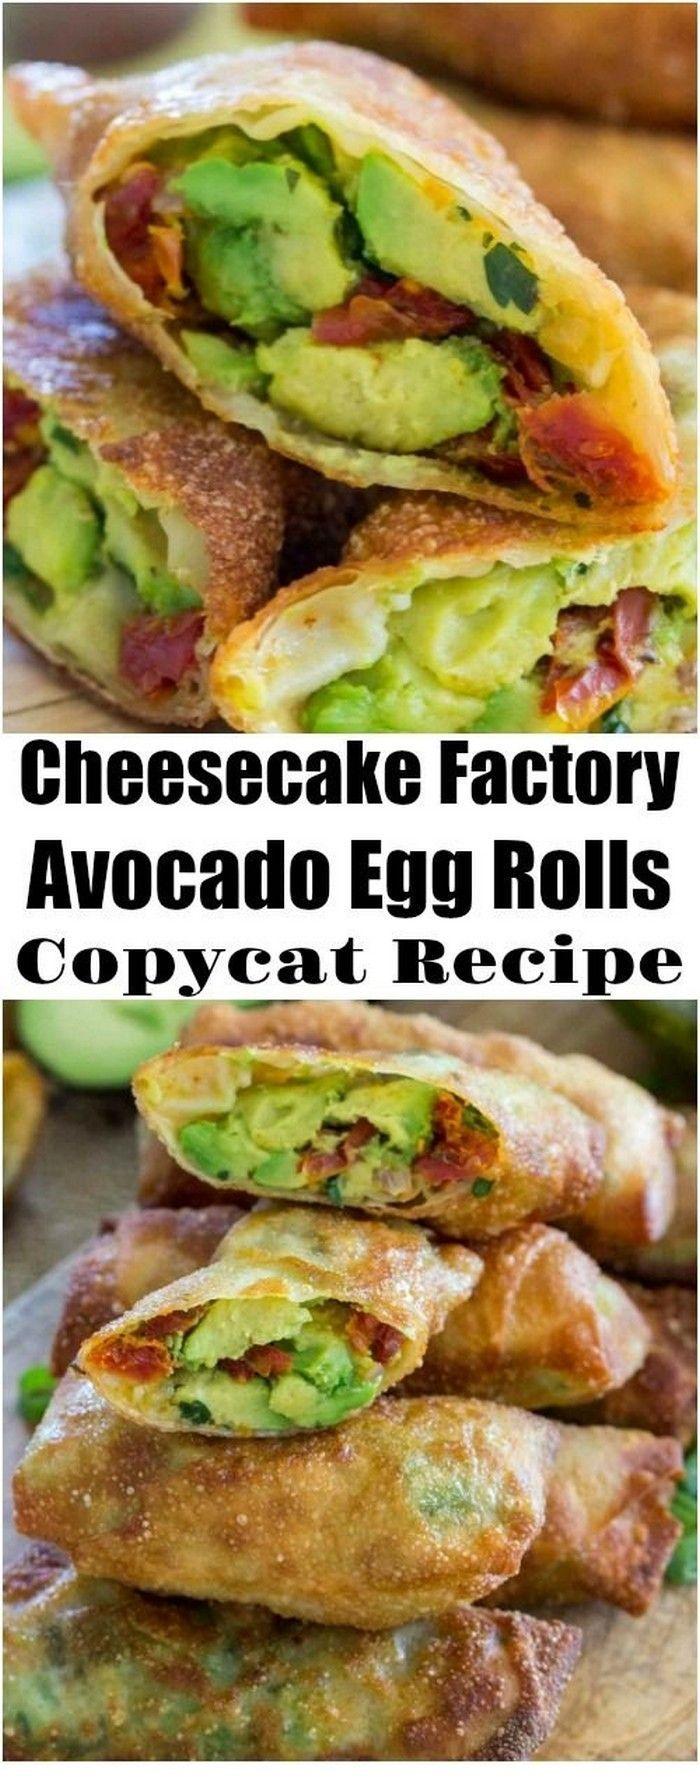 Cheesecake Factory Avocado Egg Rolls Copycat Recipe | Avocado Recipes - #Avocado #Cheesecake #Copycat #Egg #Factory #recipe #Recipes #Rolls #cheesecakefactoryrecipes